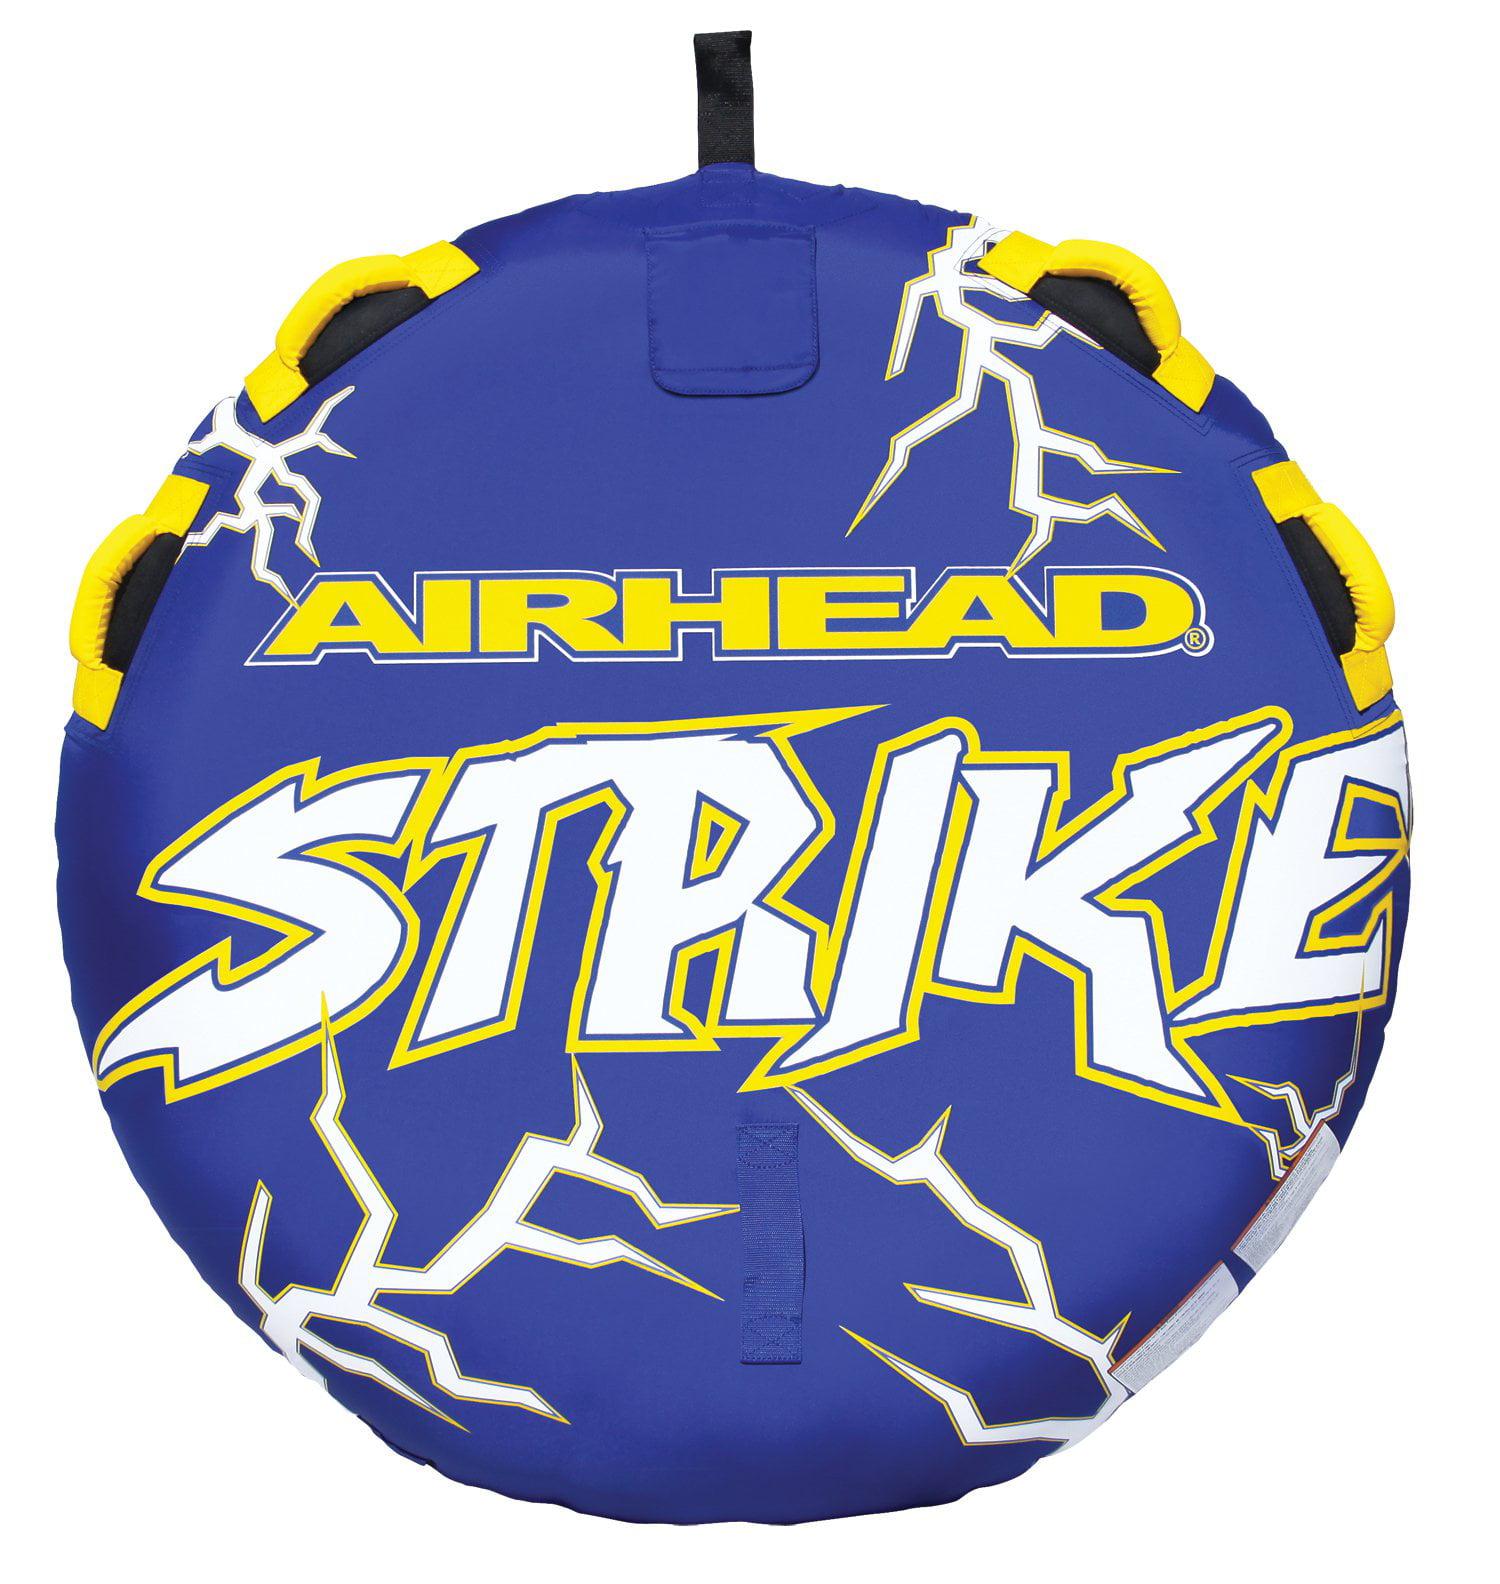 Airhead Strike 2 Inflatable Single Rider Towable by Kwik Tek